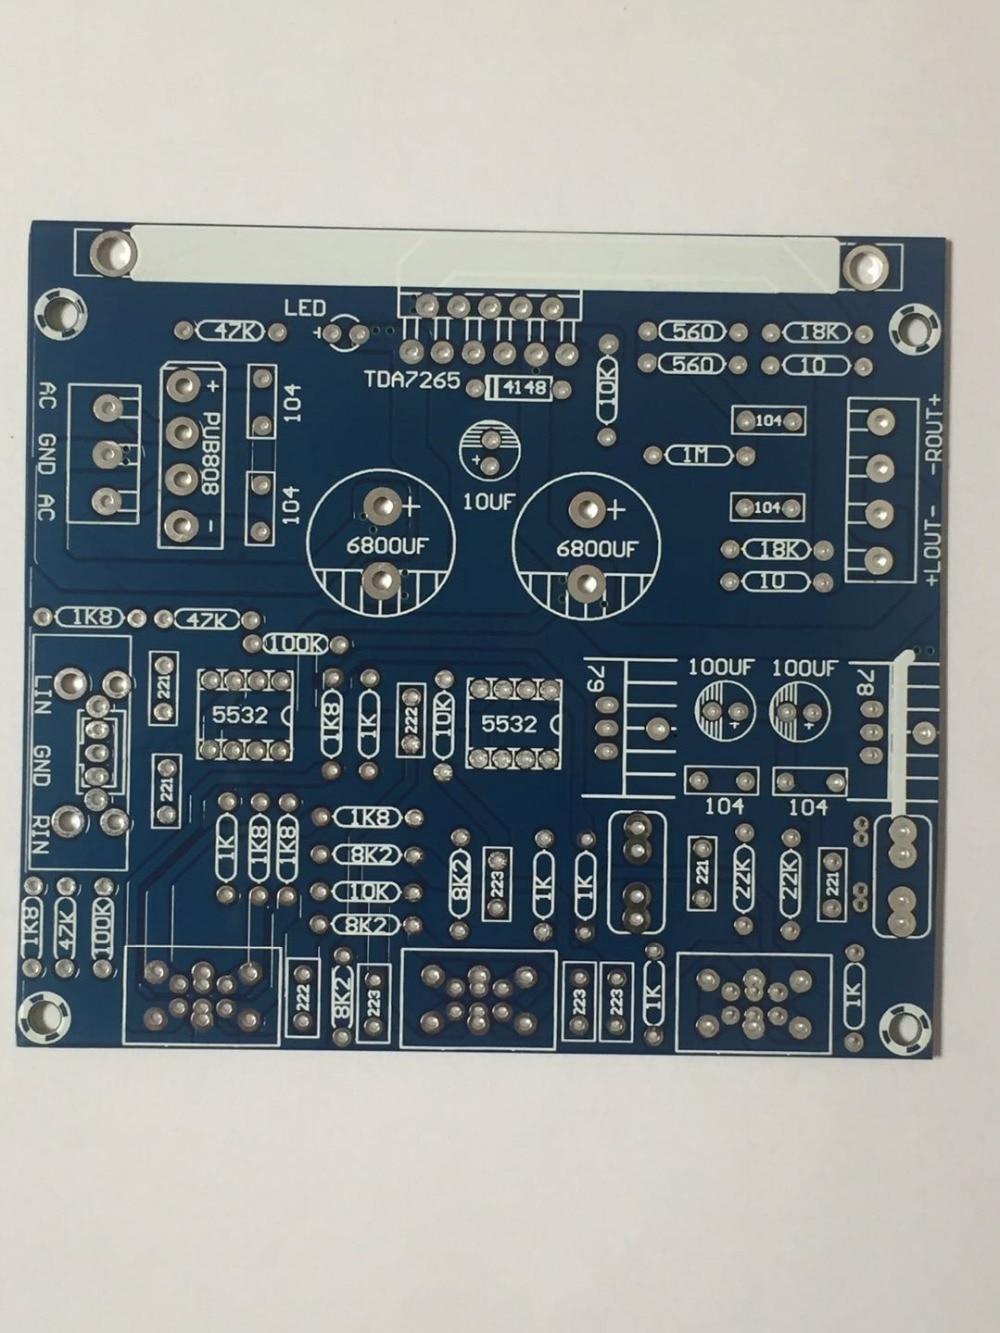 Fannyda Hi Fi TDA7265 + NE5532 домашние усилители мощности PCB пустые платы